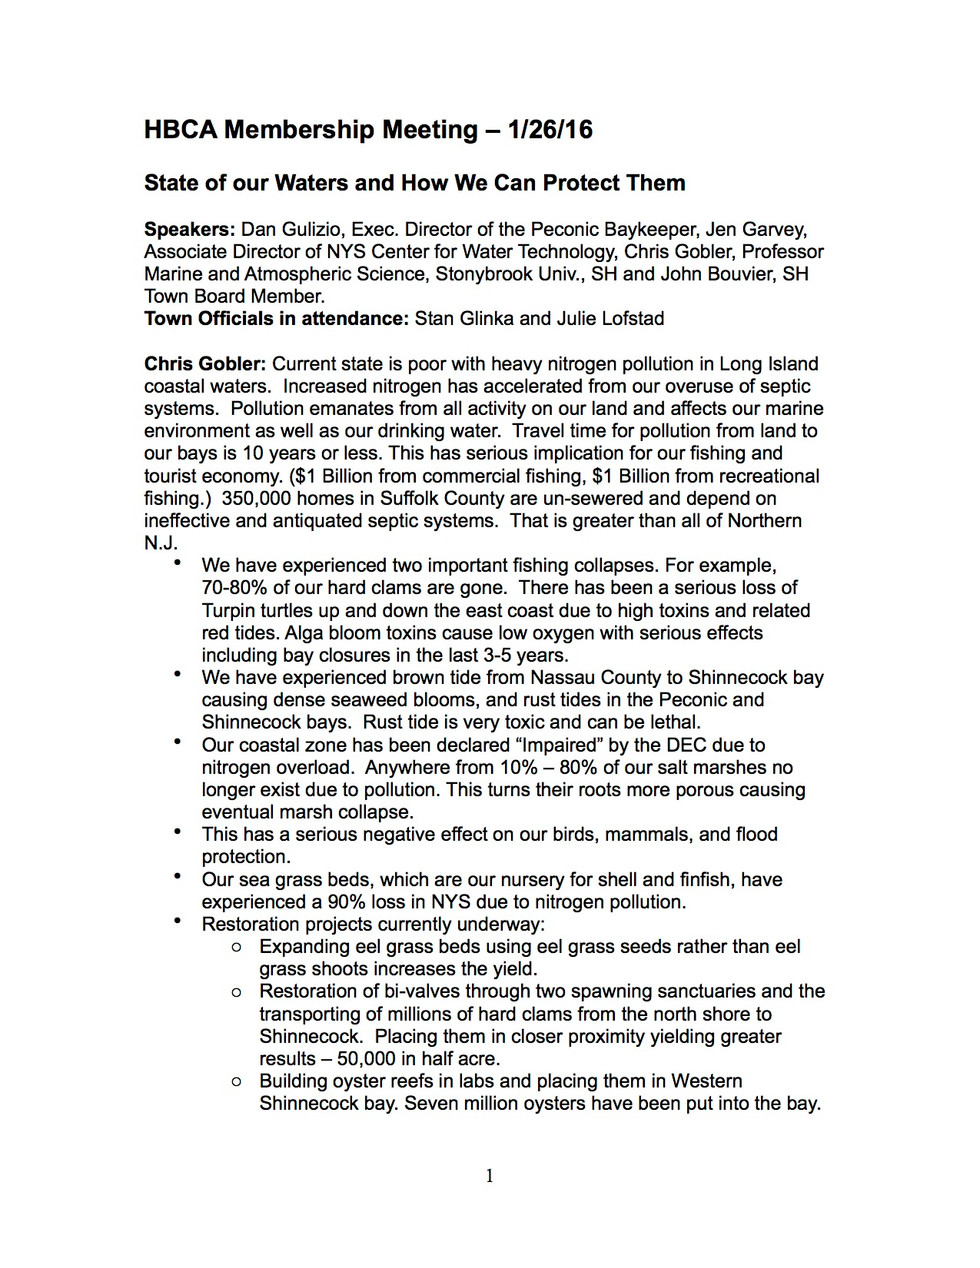 HBCA Membership Meeting - 1/26/16 - Minutes